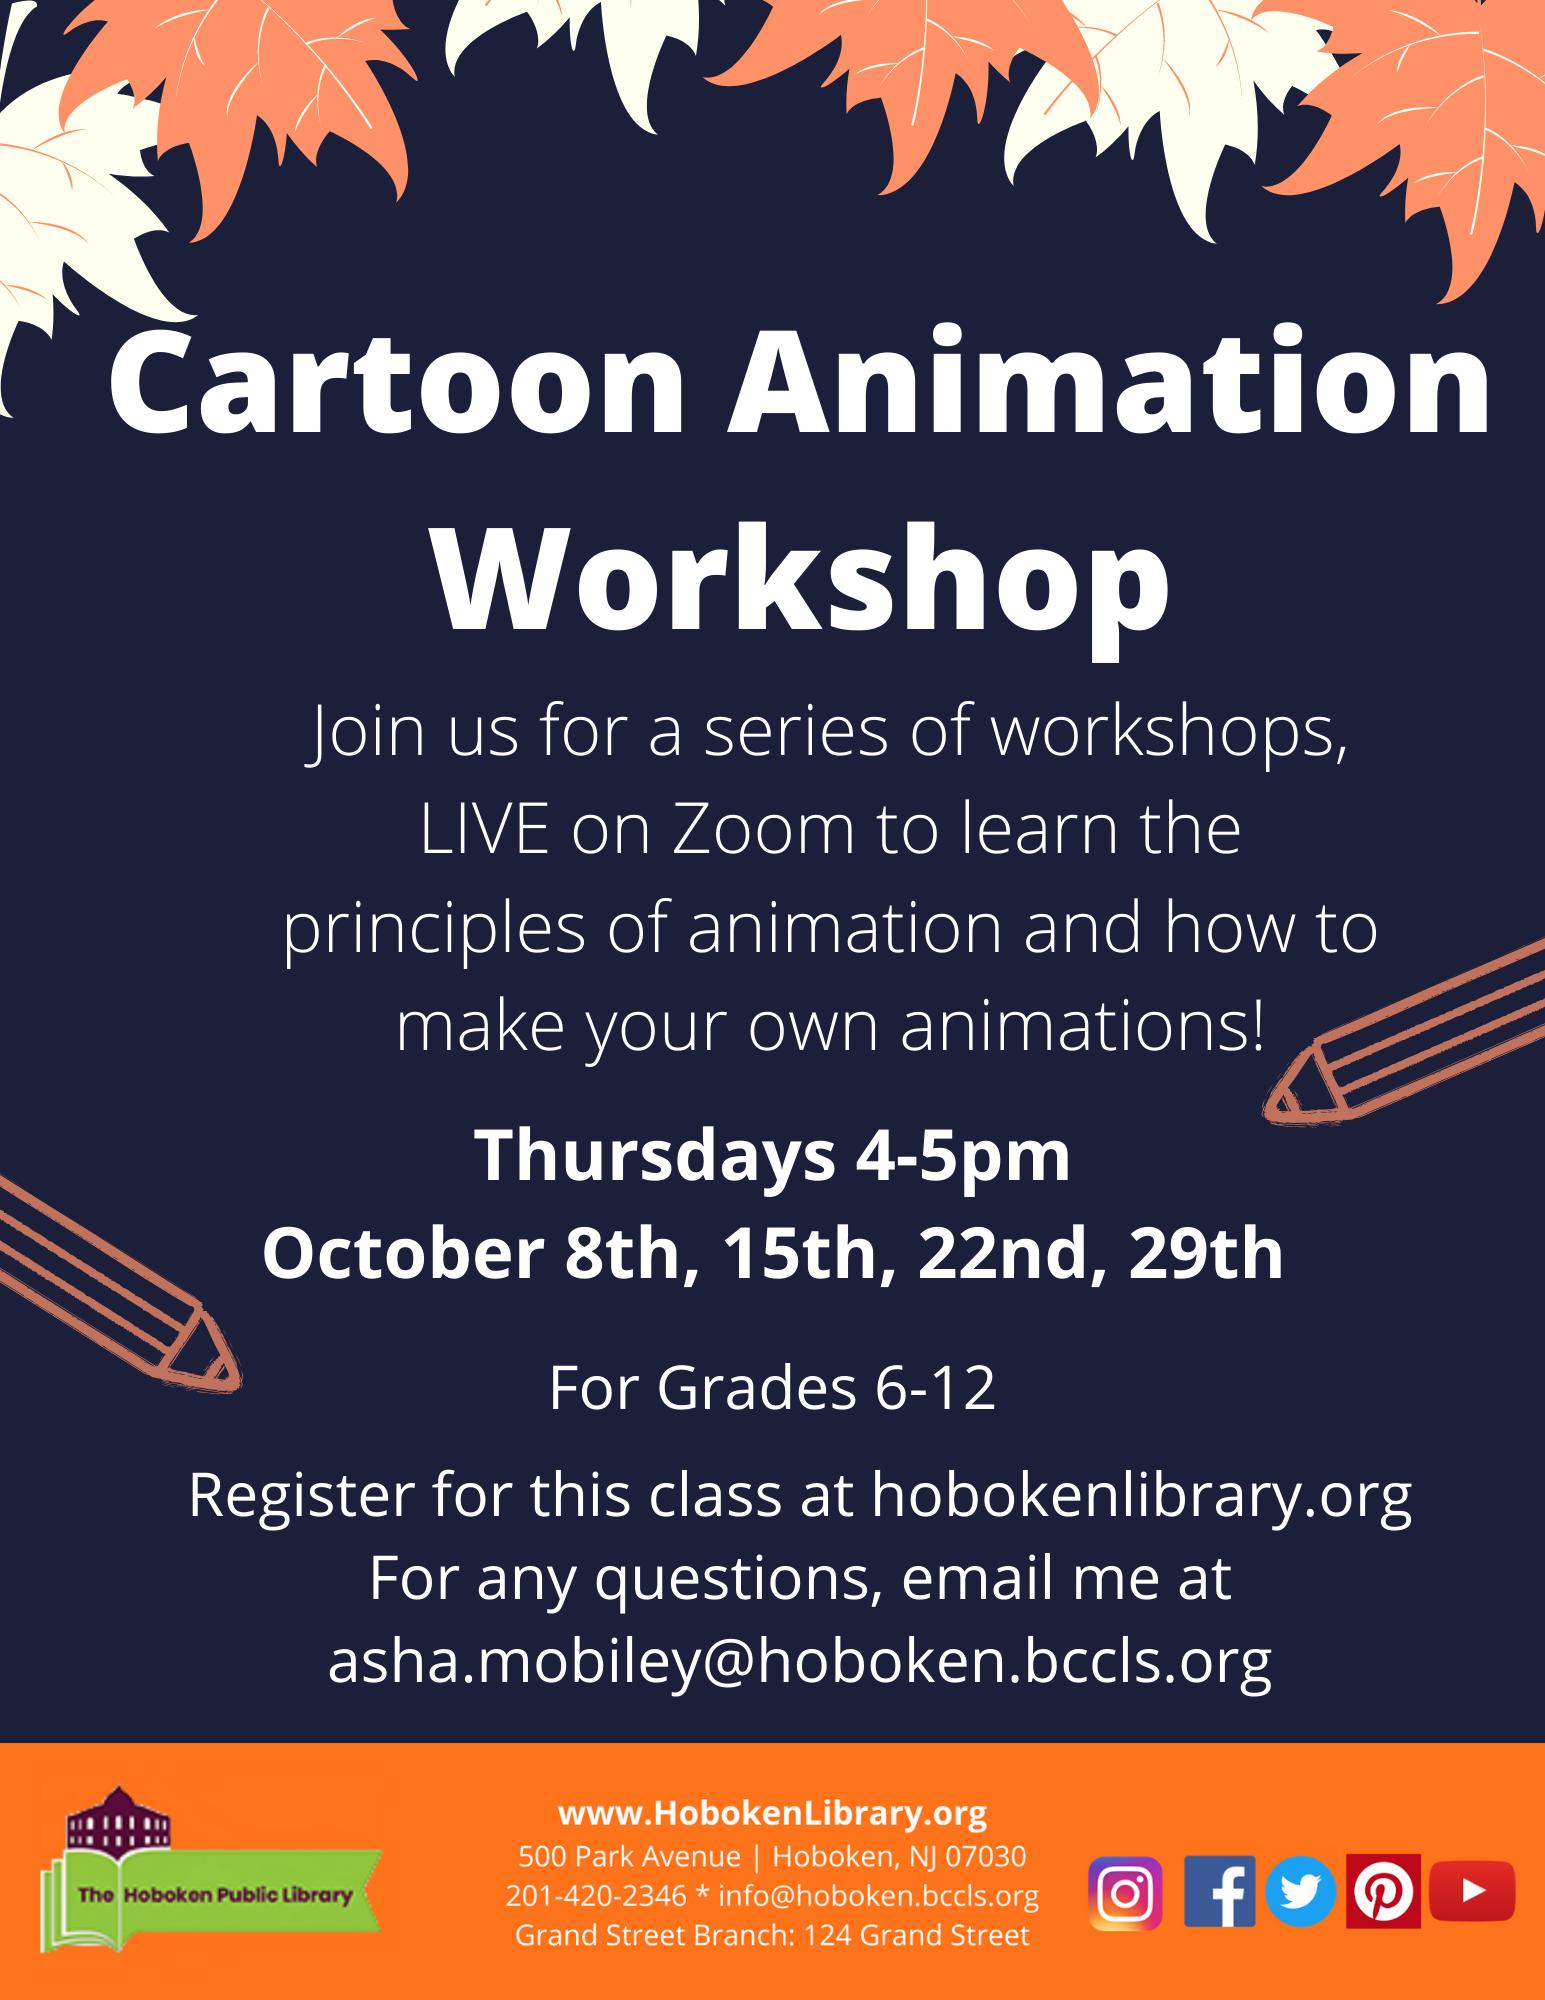 Cartoon Animation Workshop for Teens: LIVE on Zoom!